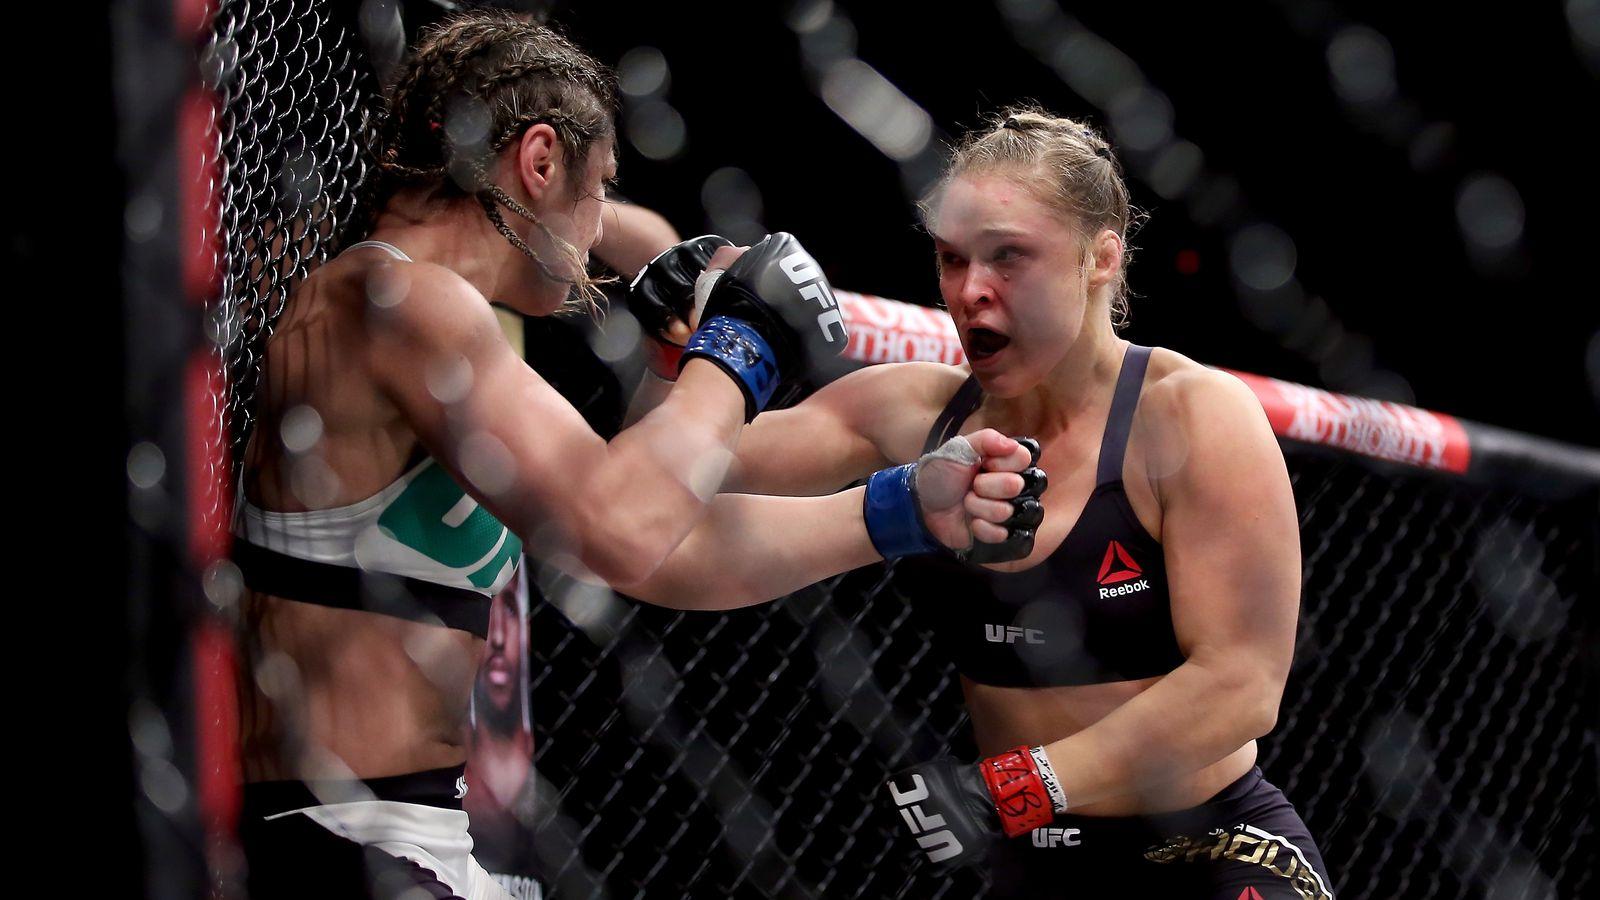 Knockout Ronda Rousey Vs Bethe Correia Full Fight Video